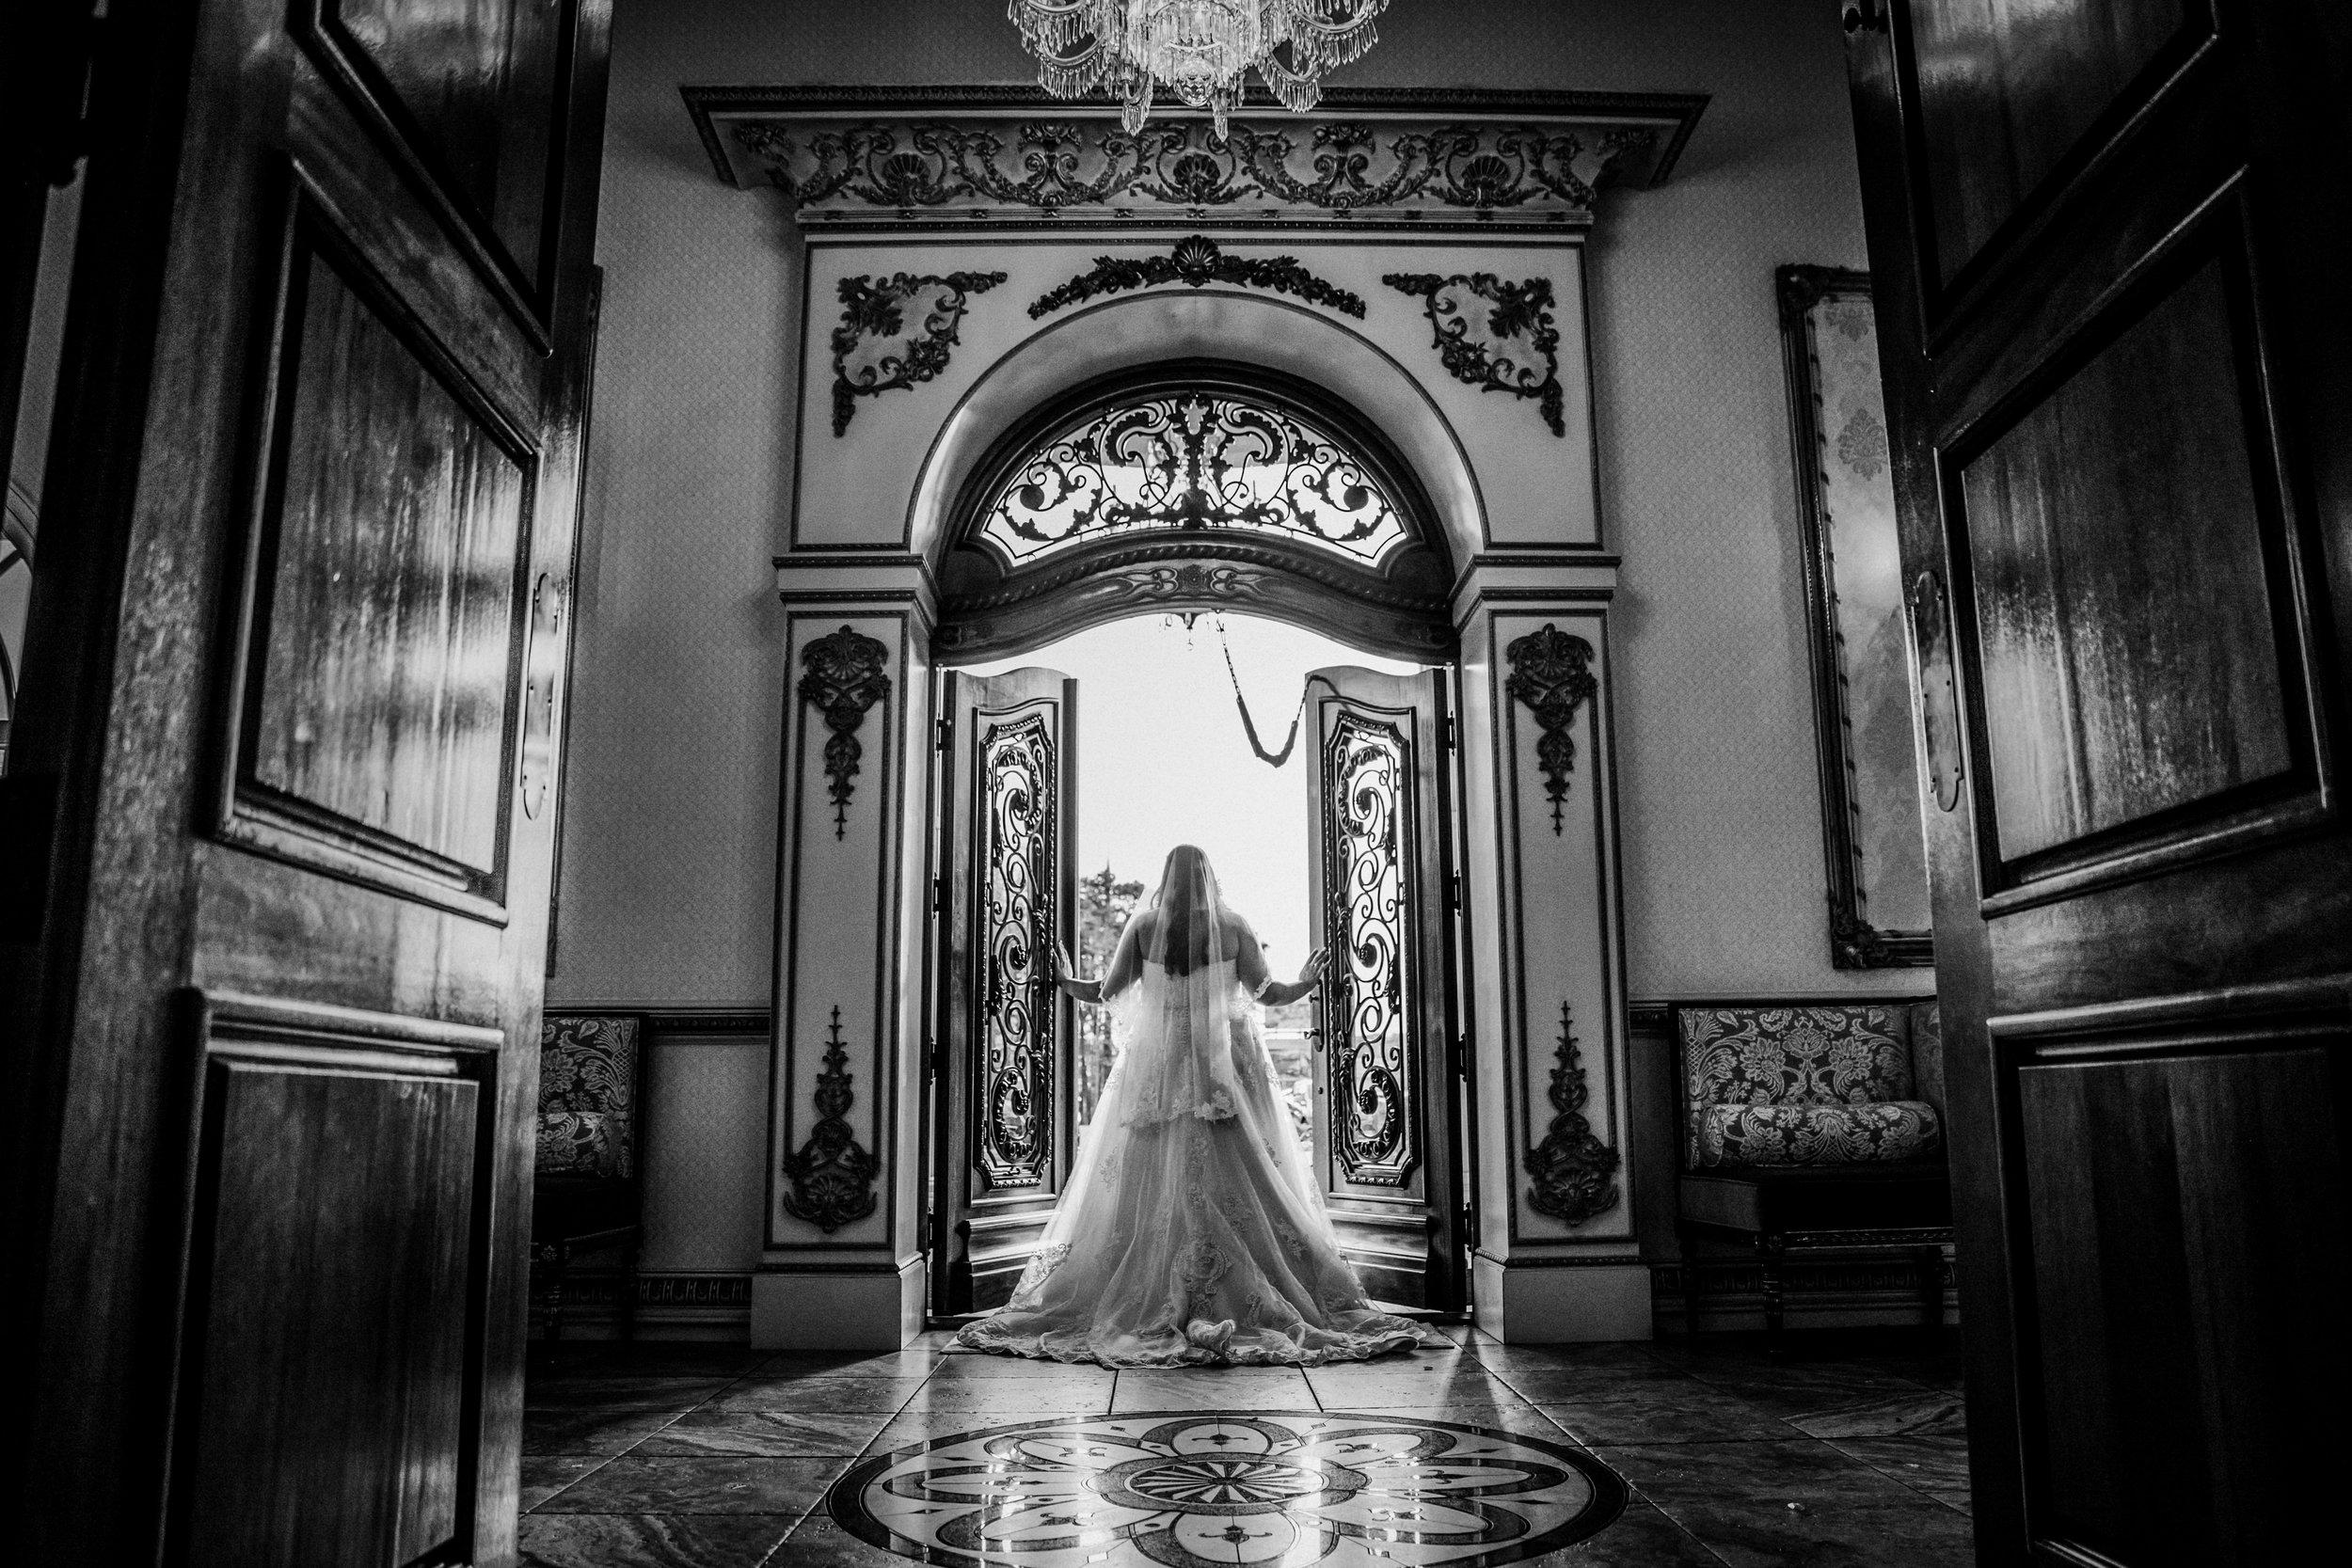 New-Jersey-Wedding-Photography-Brigalias-Deanna&Darryl-BRIDE&GROOM-BW-42.jpg